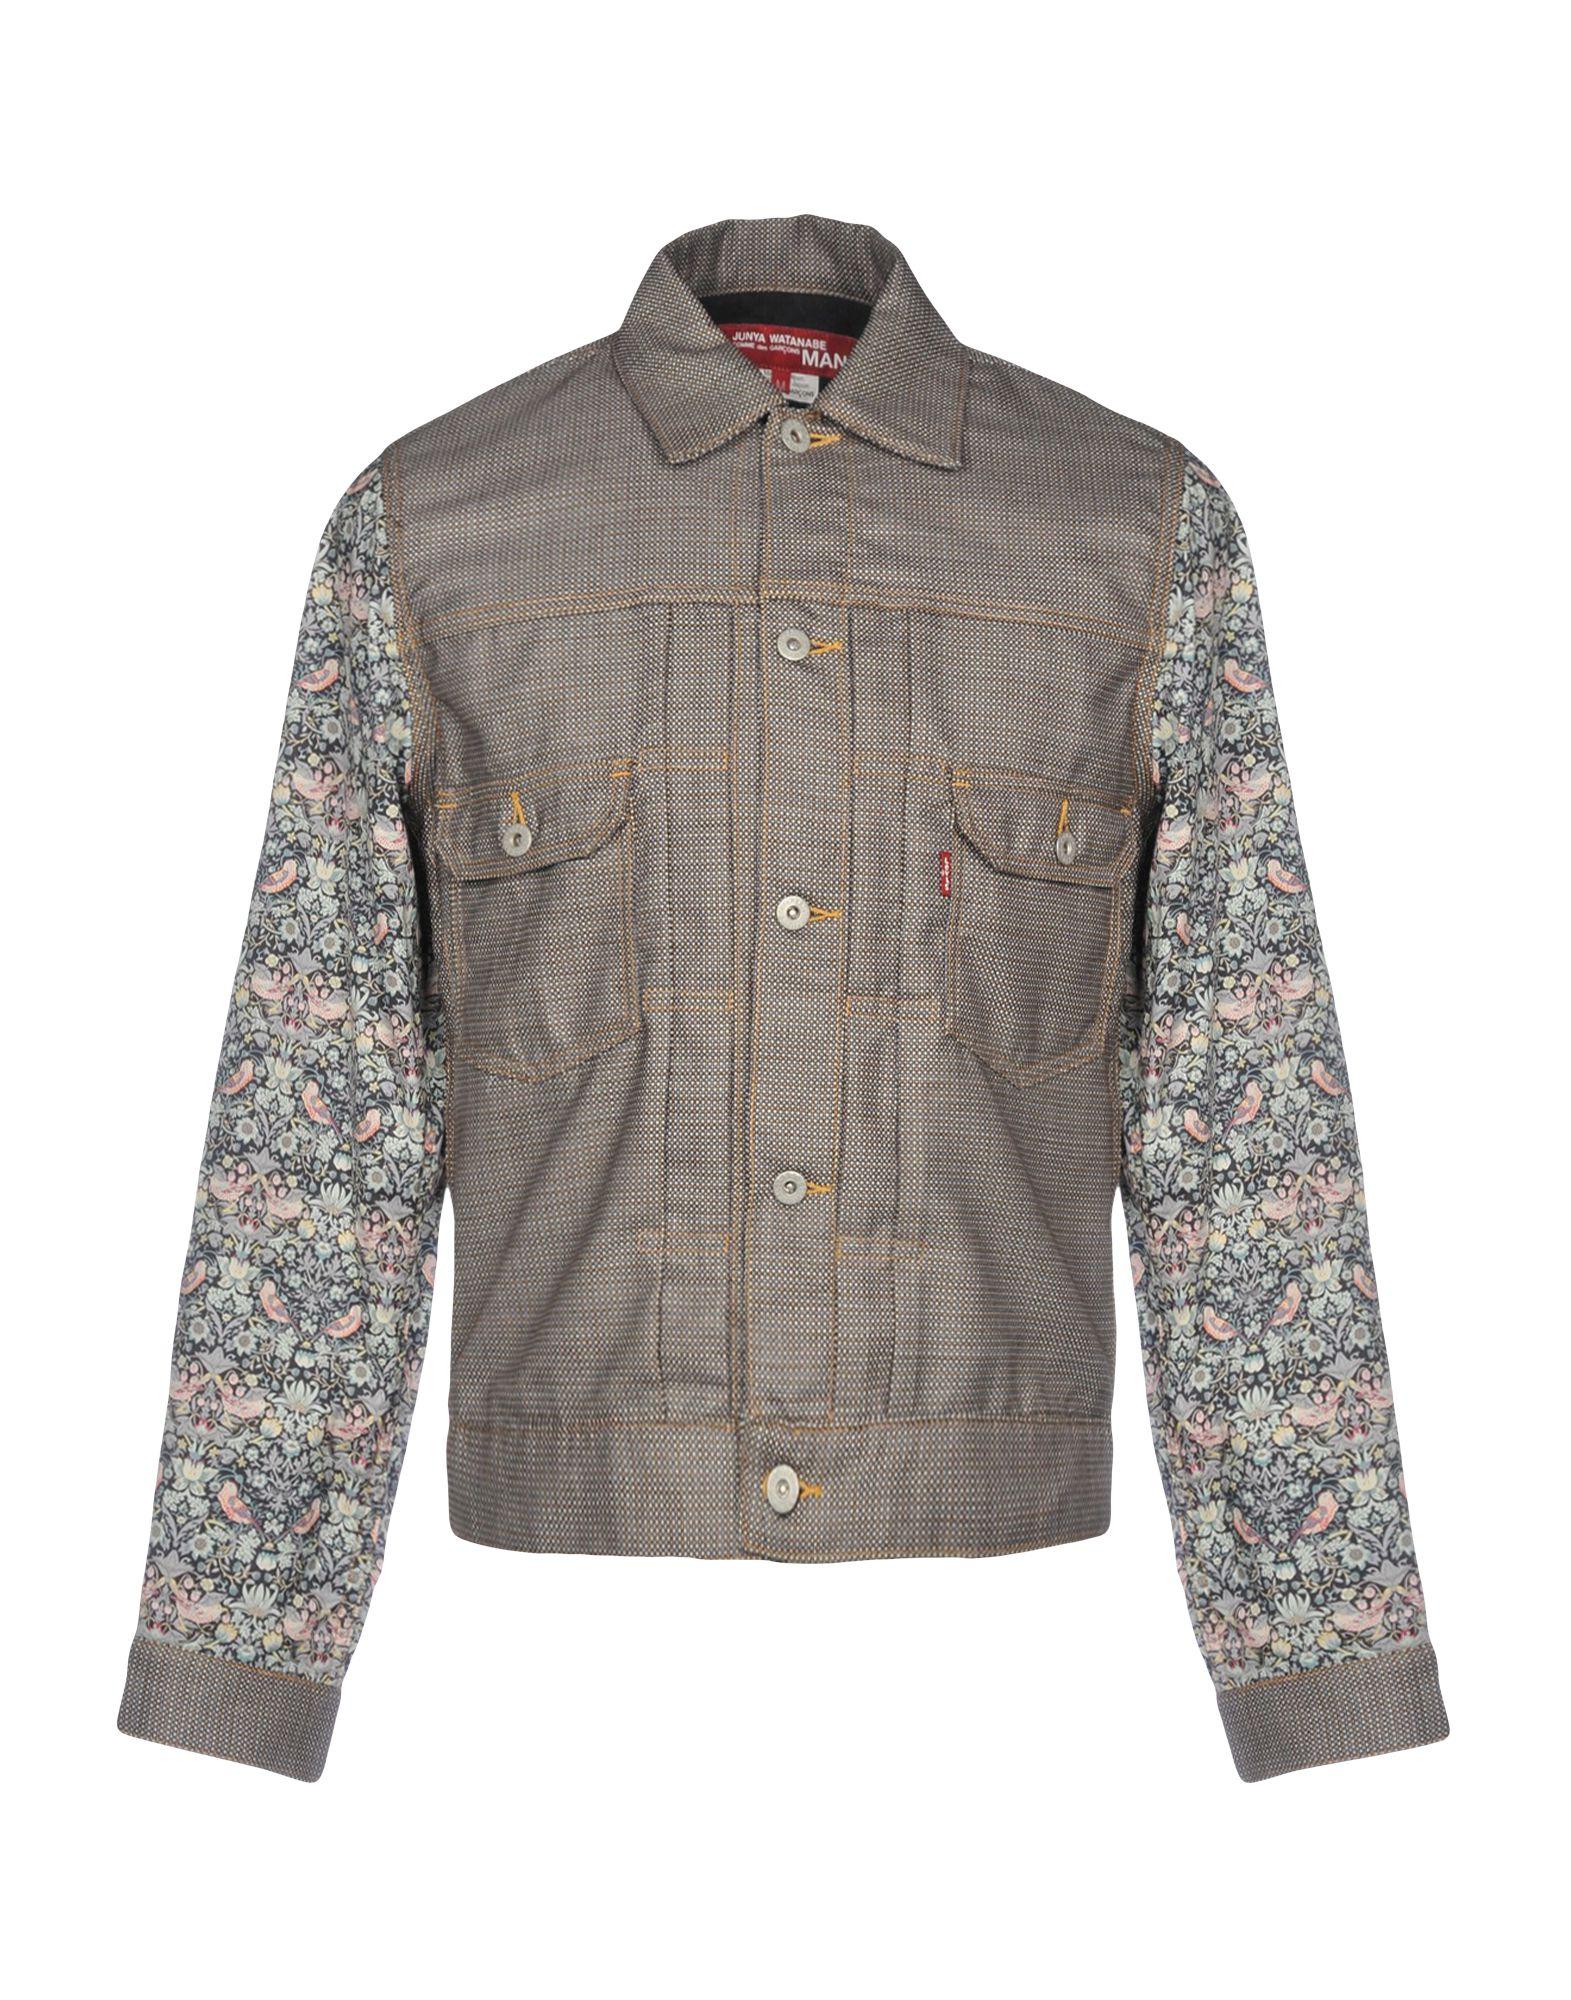 JUNYA WATANABE COMME des GARÇONS MAN X LEVI'S Куртка junya watanabe куртка